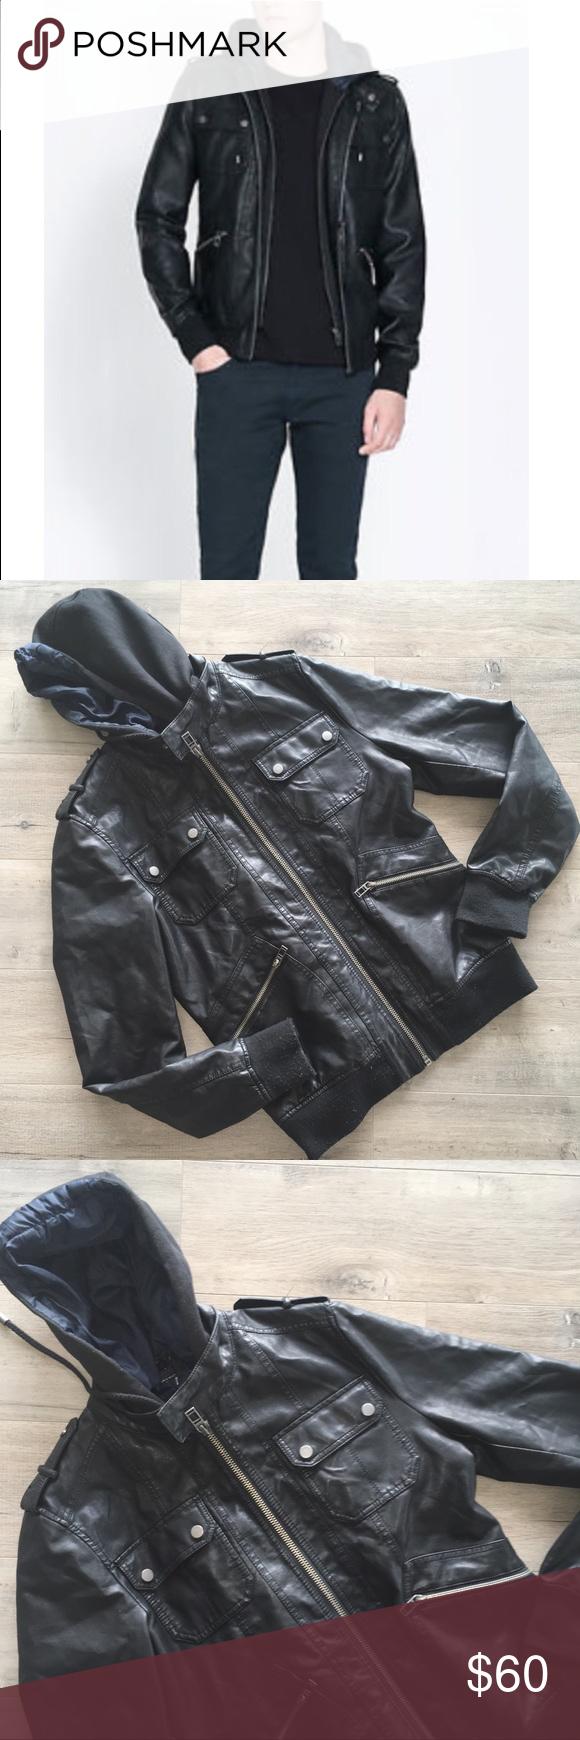 ZARA ~ed Jordan faux leather removable hood jacket | Black